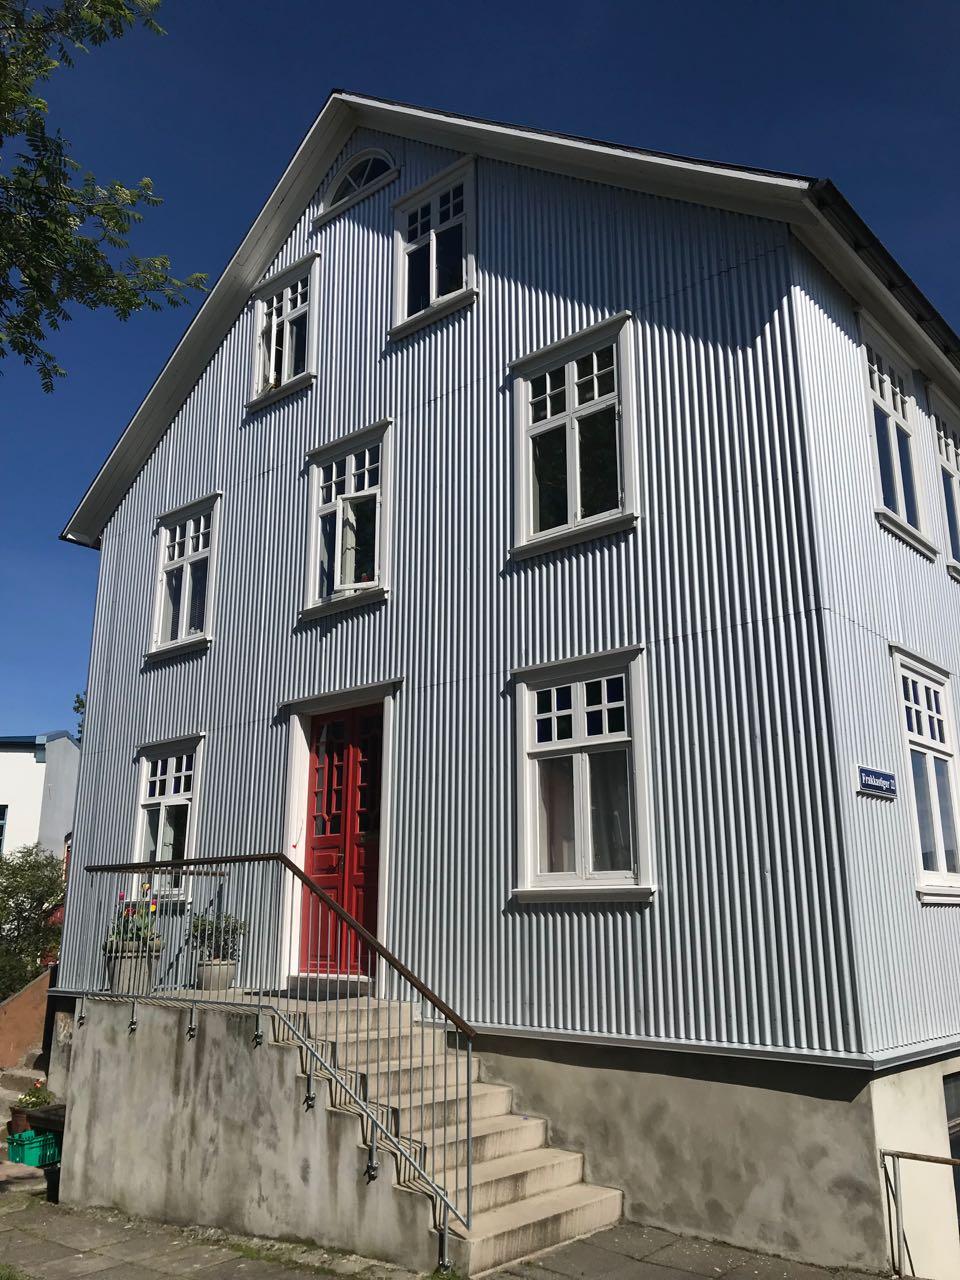 Reykjavik house.jpg